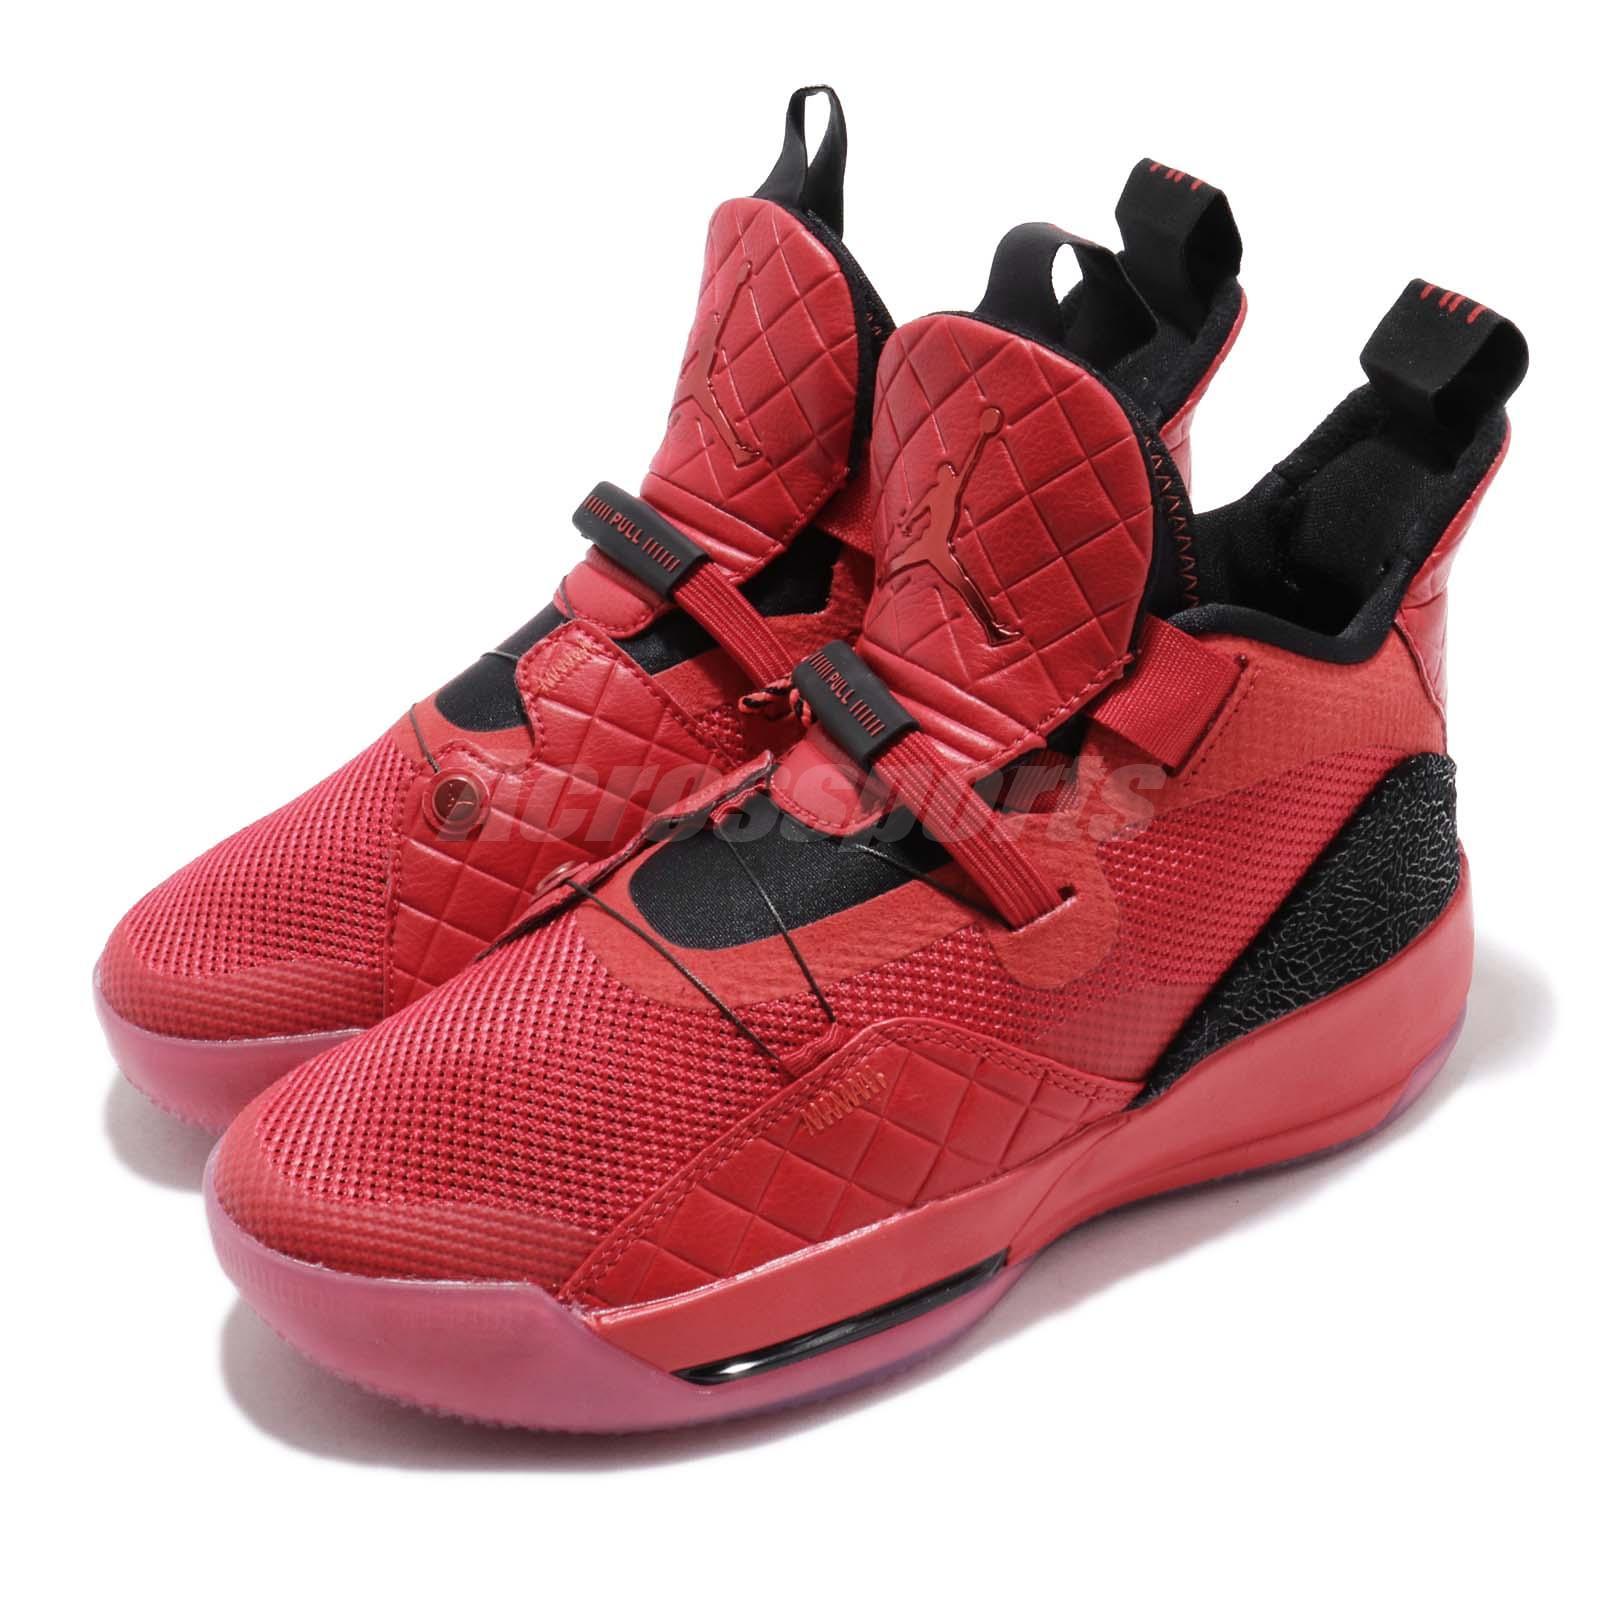 Nike Air Jordan XXXIII GS 33 AJ33 Retro